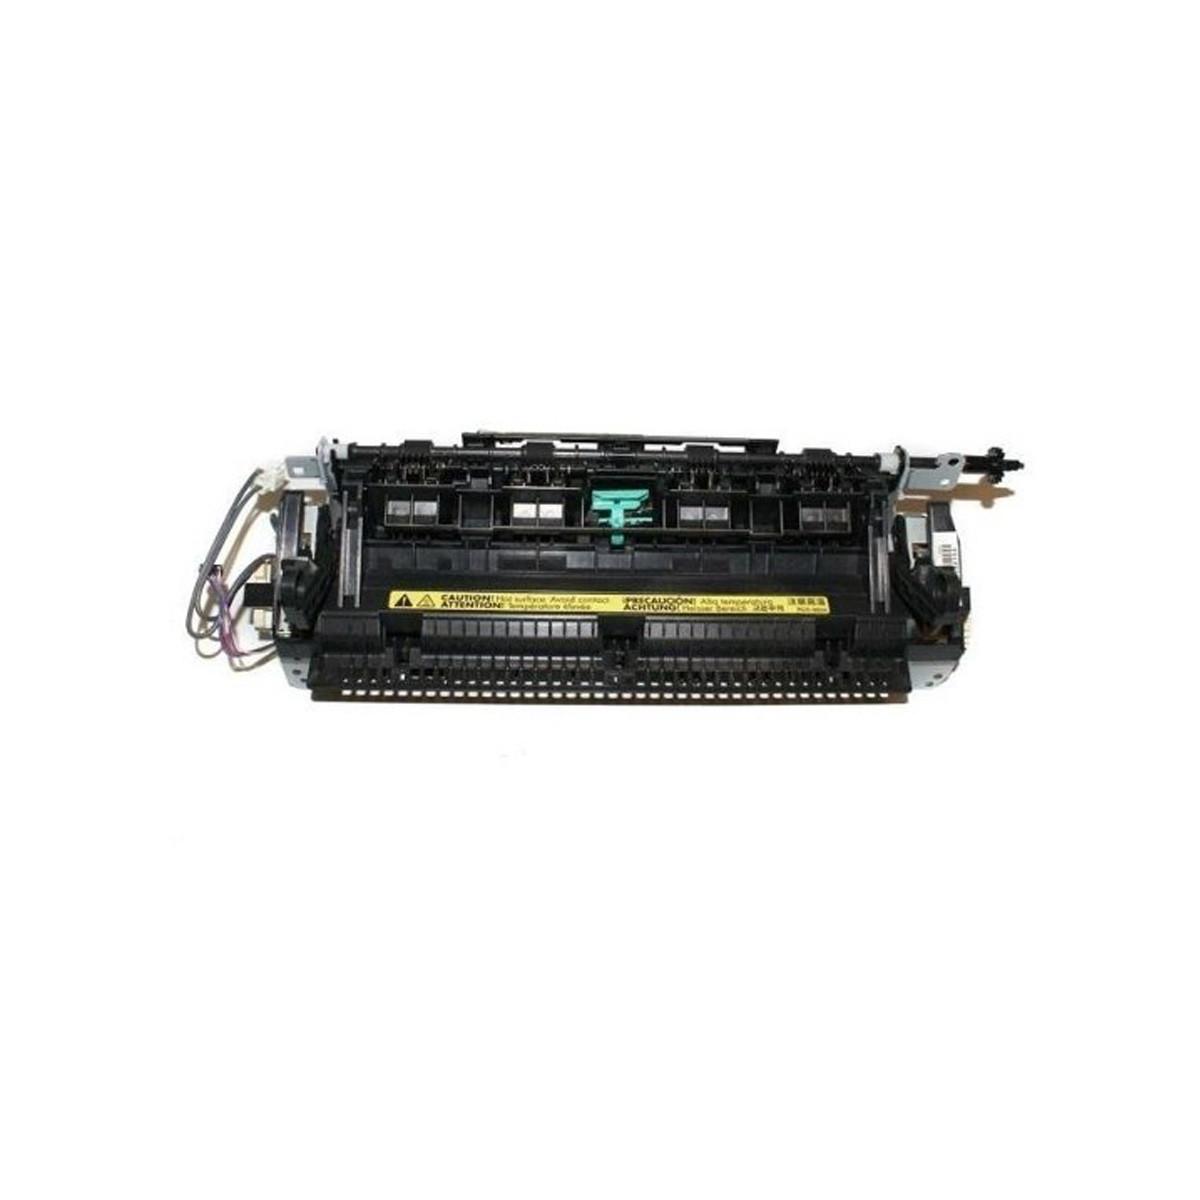 Unidade Fusora HP M1536 P1606 M201 M225 | SY191218AAA1 | 110V Compatível